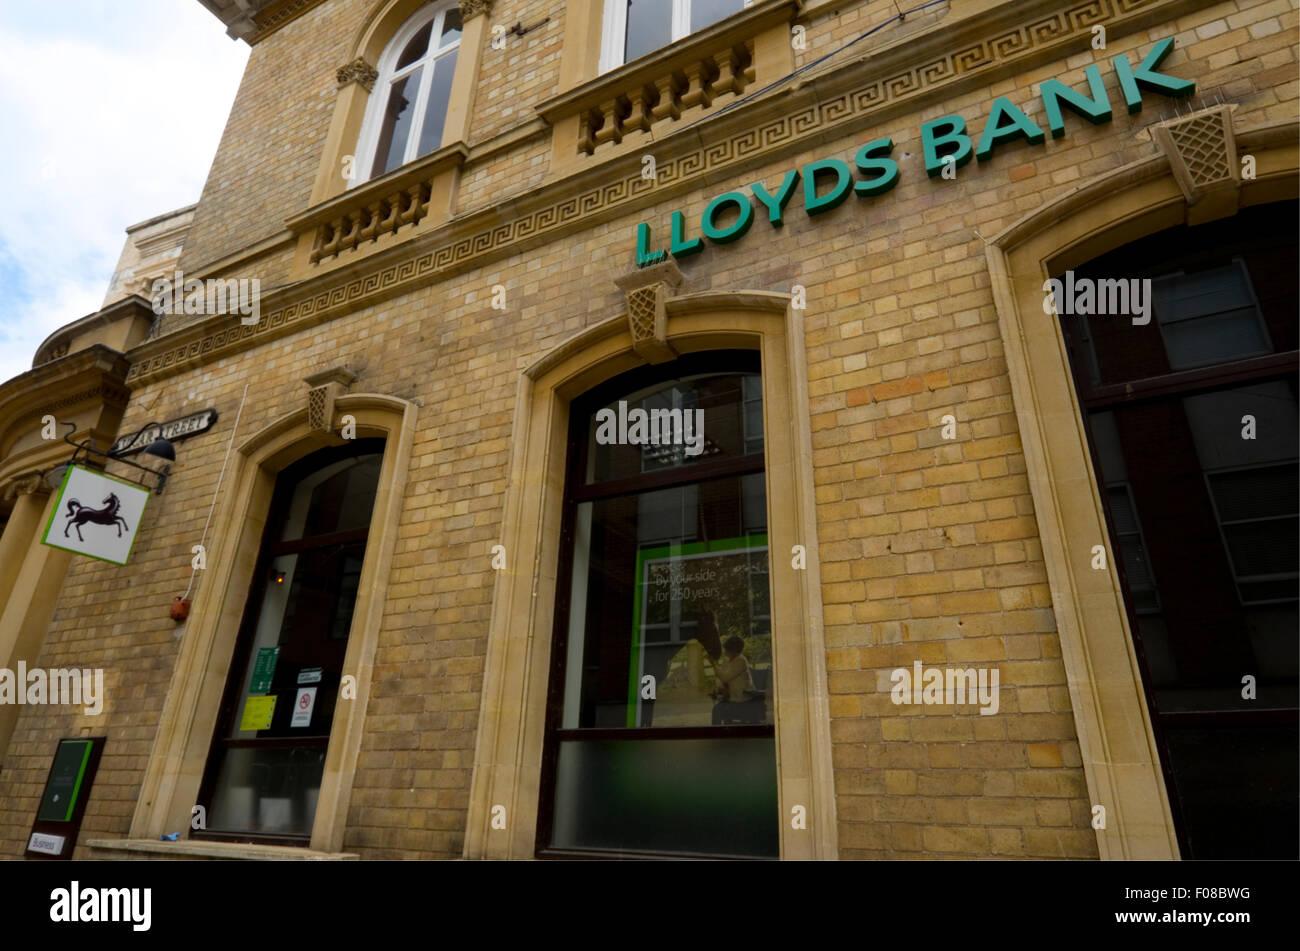 Lloyds bank, Kidderminster Branch, Vicar Street. - Stock Image